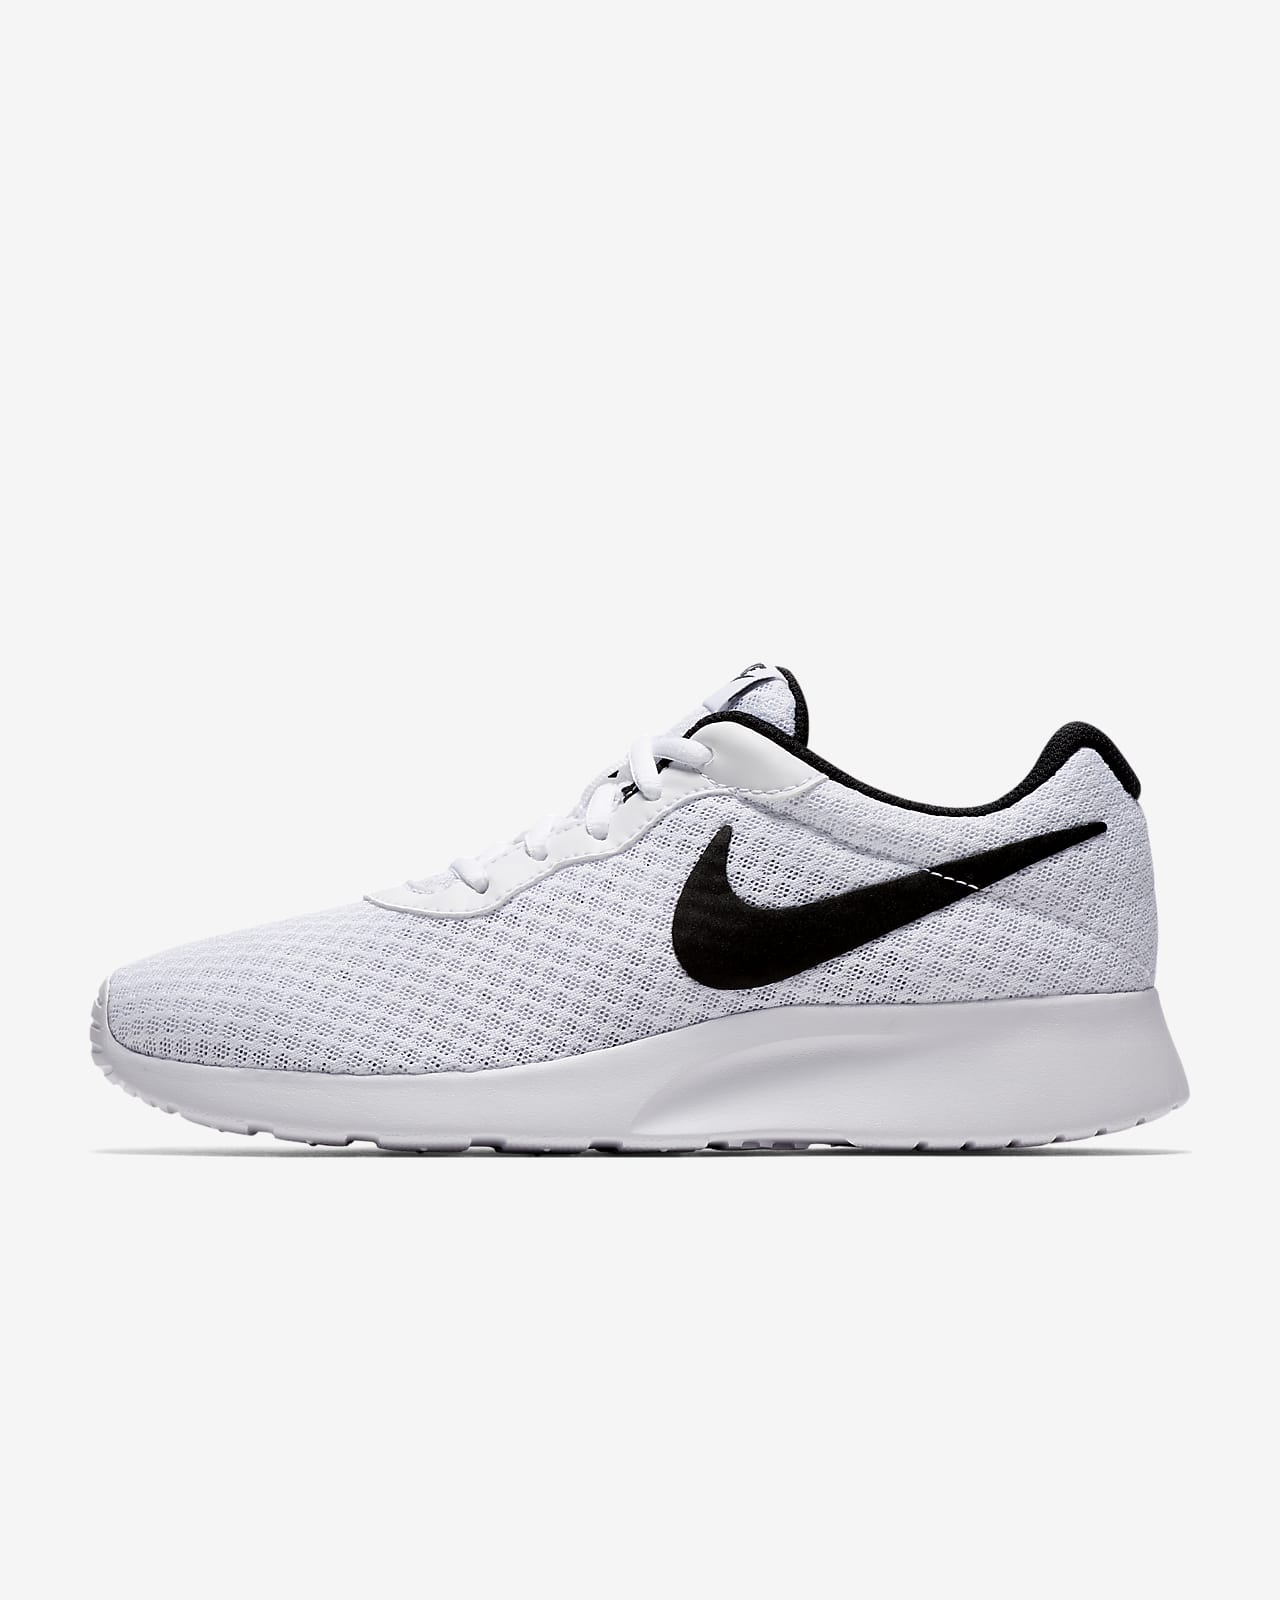 Nike Tanjun Women's Shoe. Nike LU